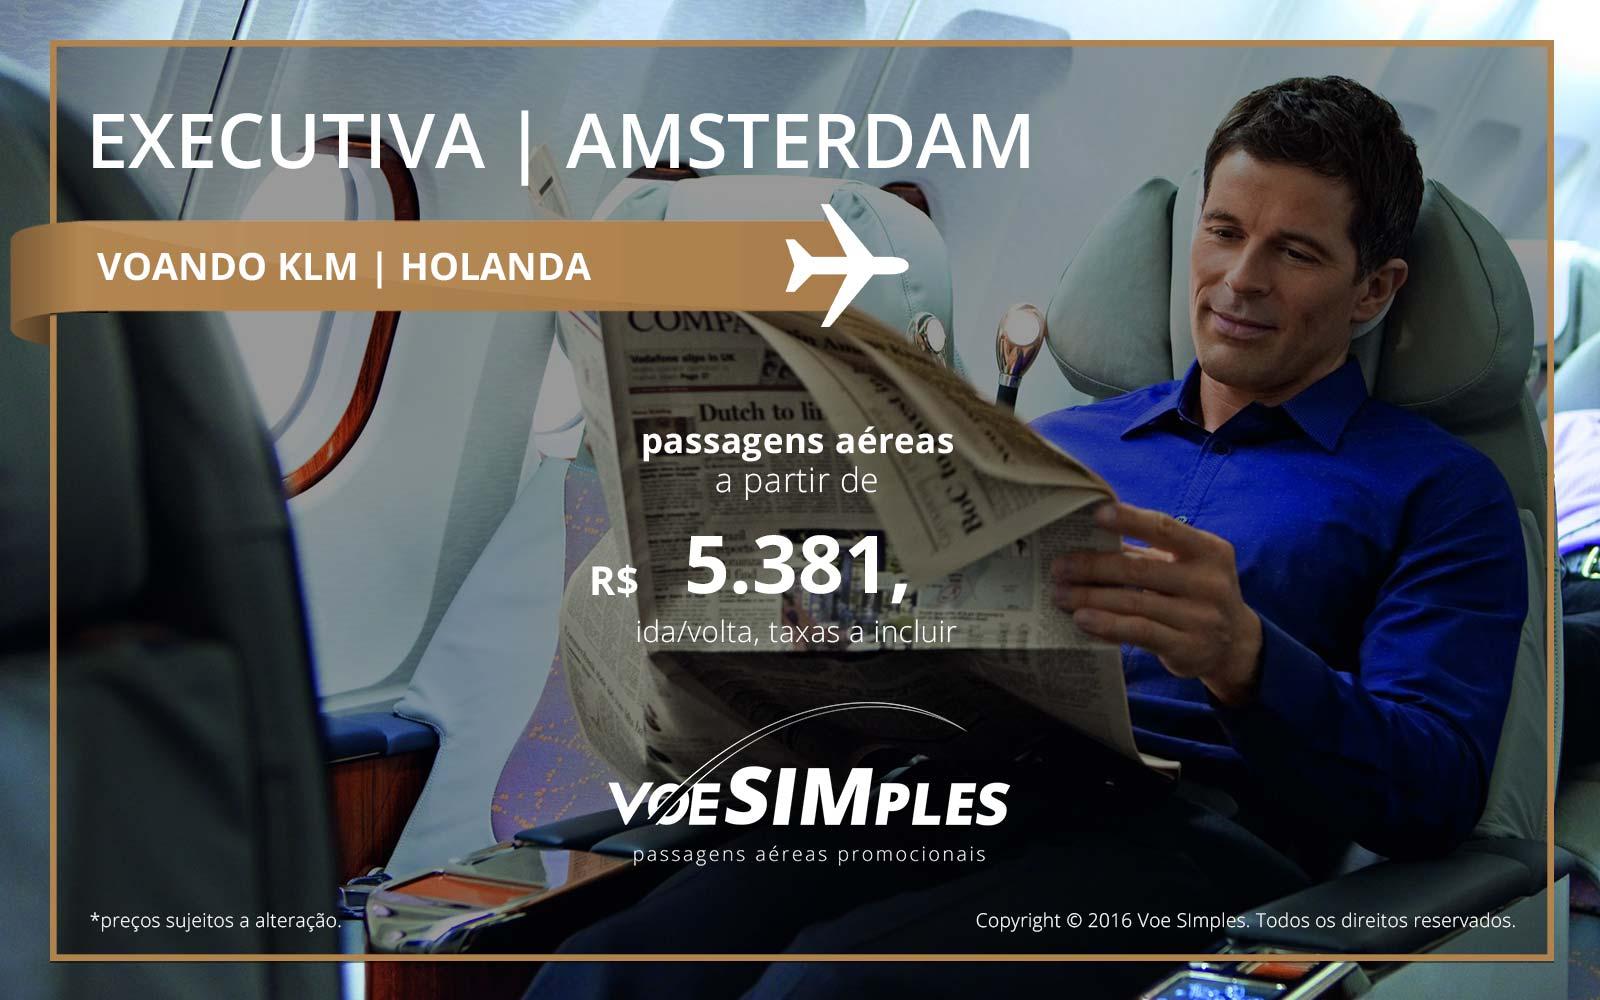 Passagem aérea Classe Executiva KLM para Amsterdã